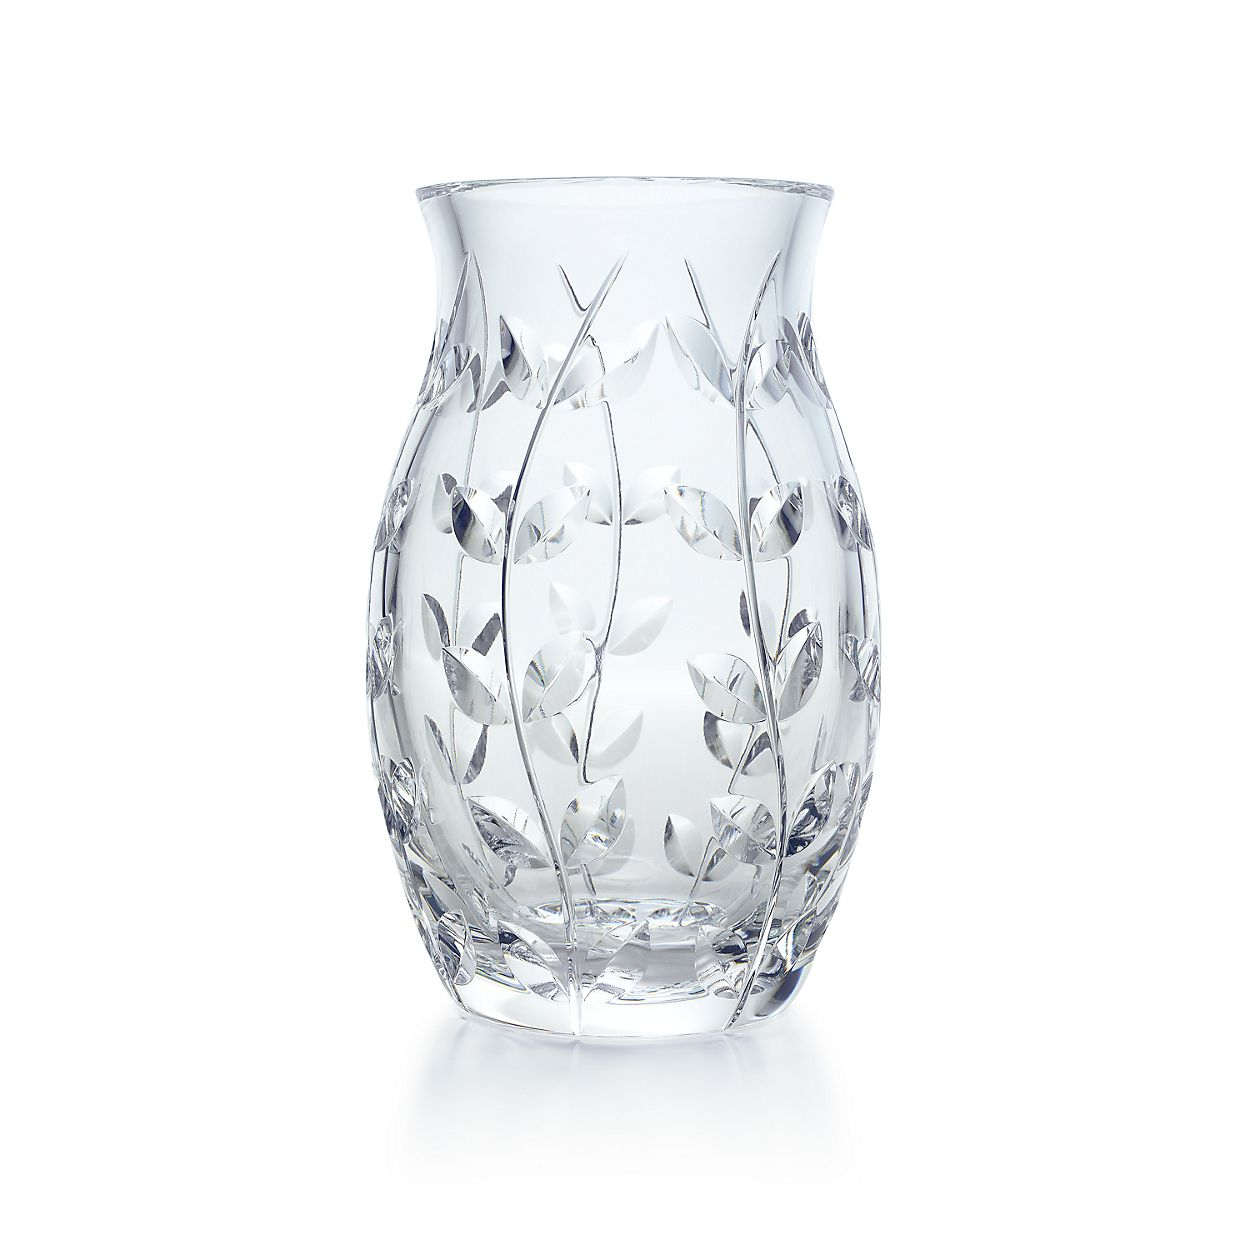 Floral vine tulip vase in hand cut crystal tiffany co floral vinetulip vase floral vinetulip vase reviewsmspy